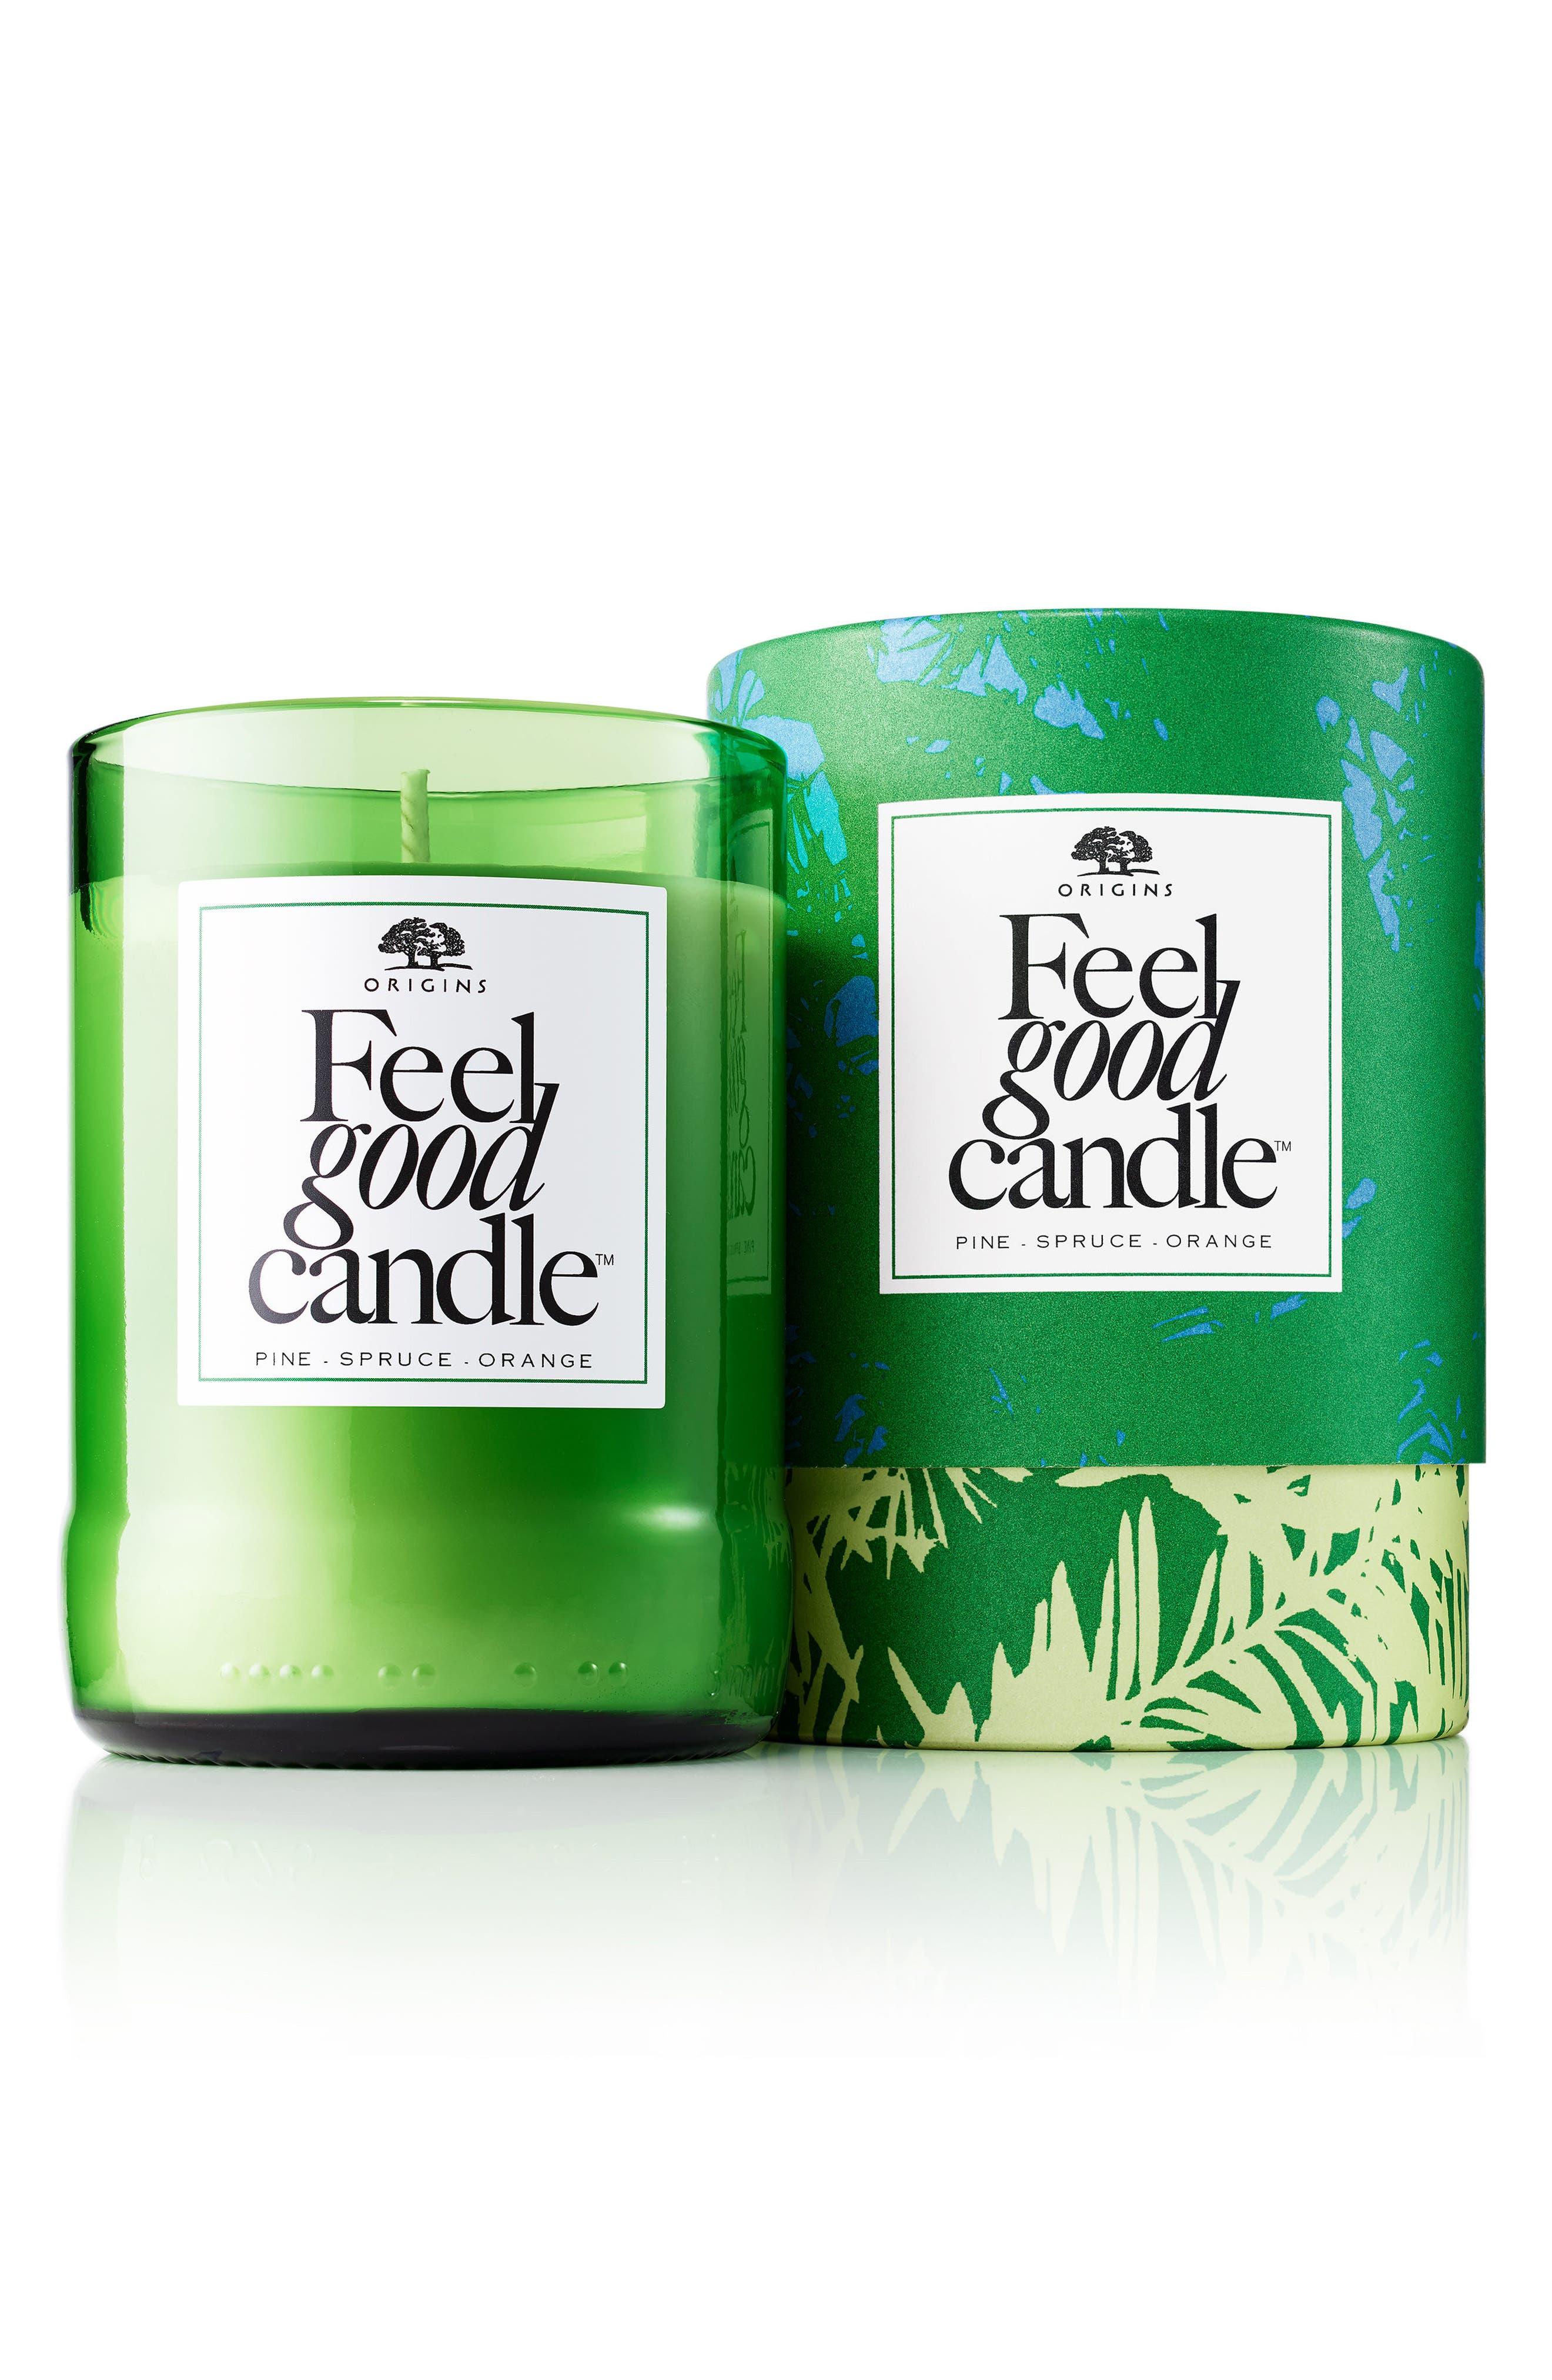 Main Image - Origins Pine, Spruce & Orange Feel Good Candle (Limited Edition)